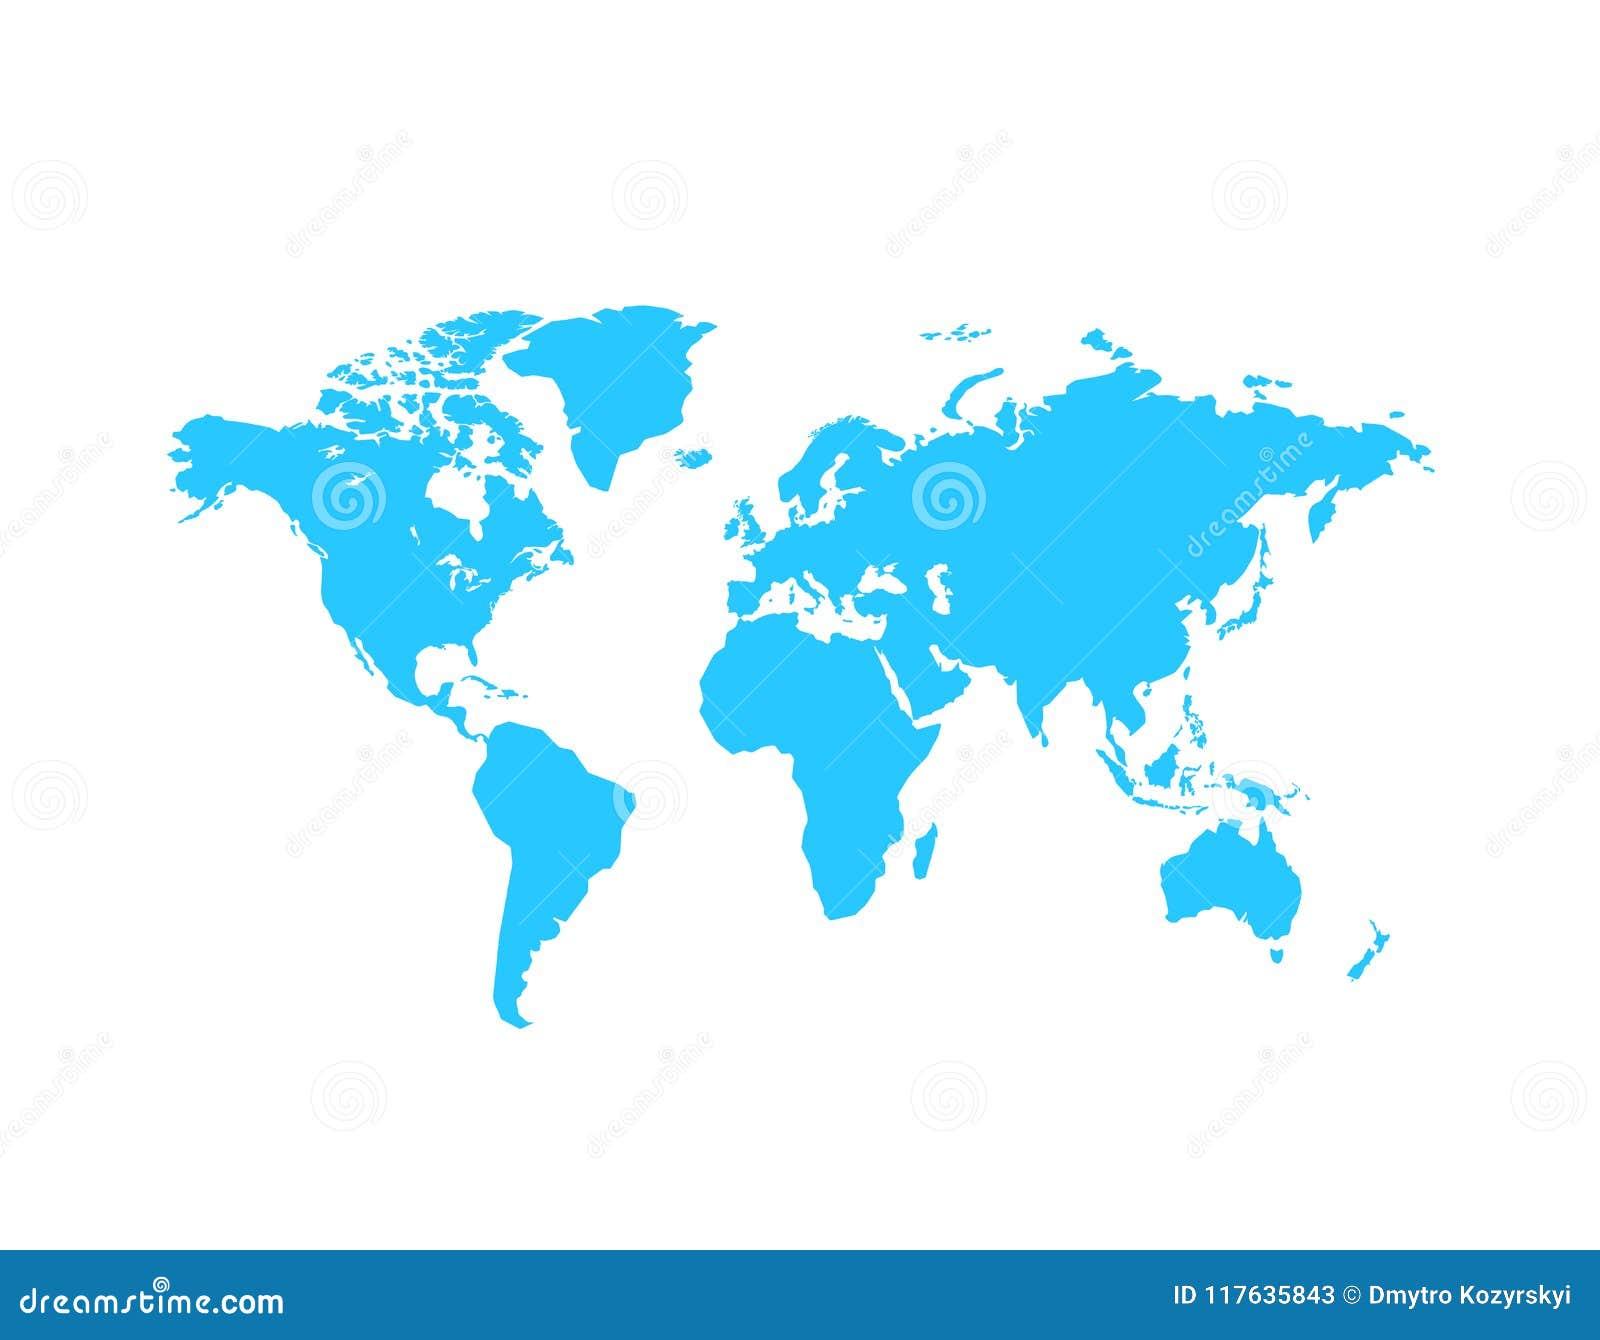 World map vector isolated on white background globe worldmap icon download world map vector isolated on white background globe worldmap icon stock illustration gumiabroncs Images